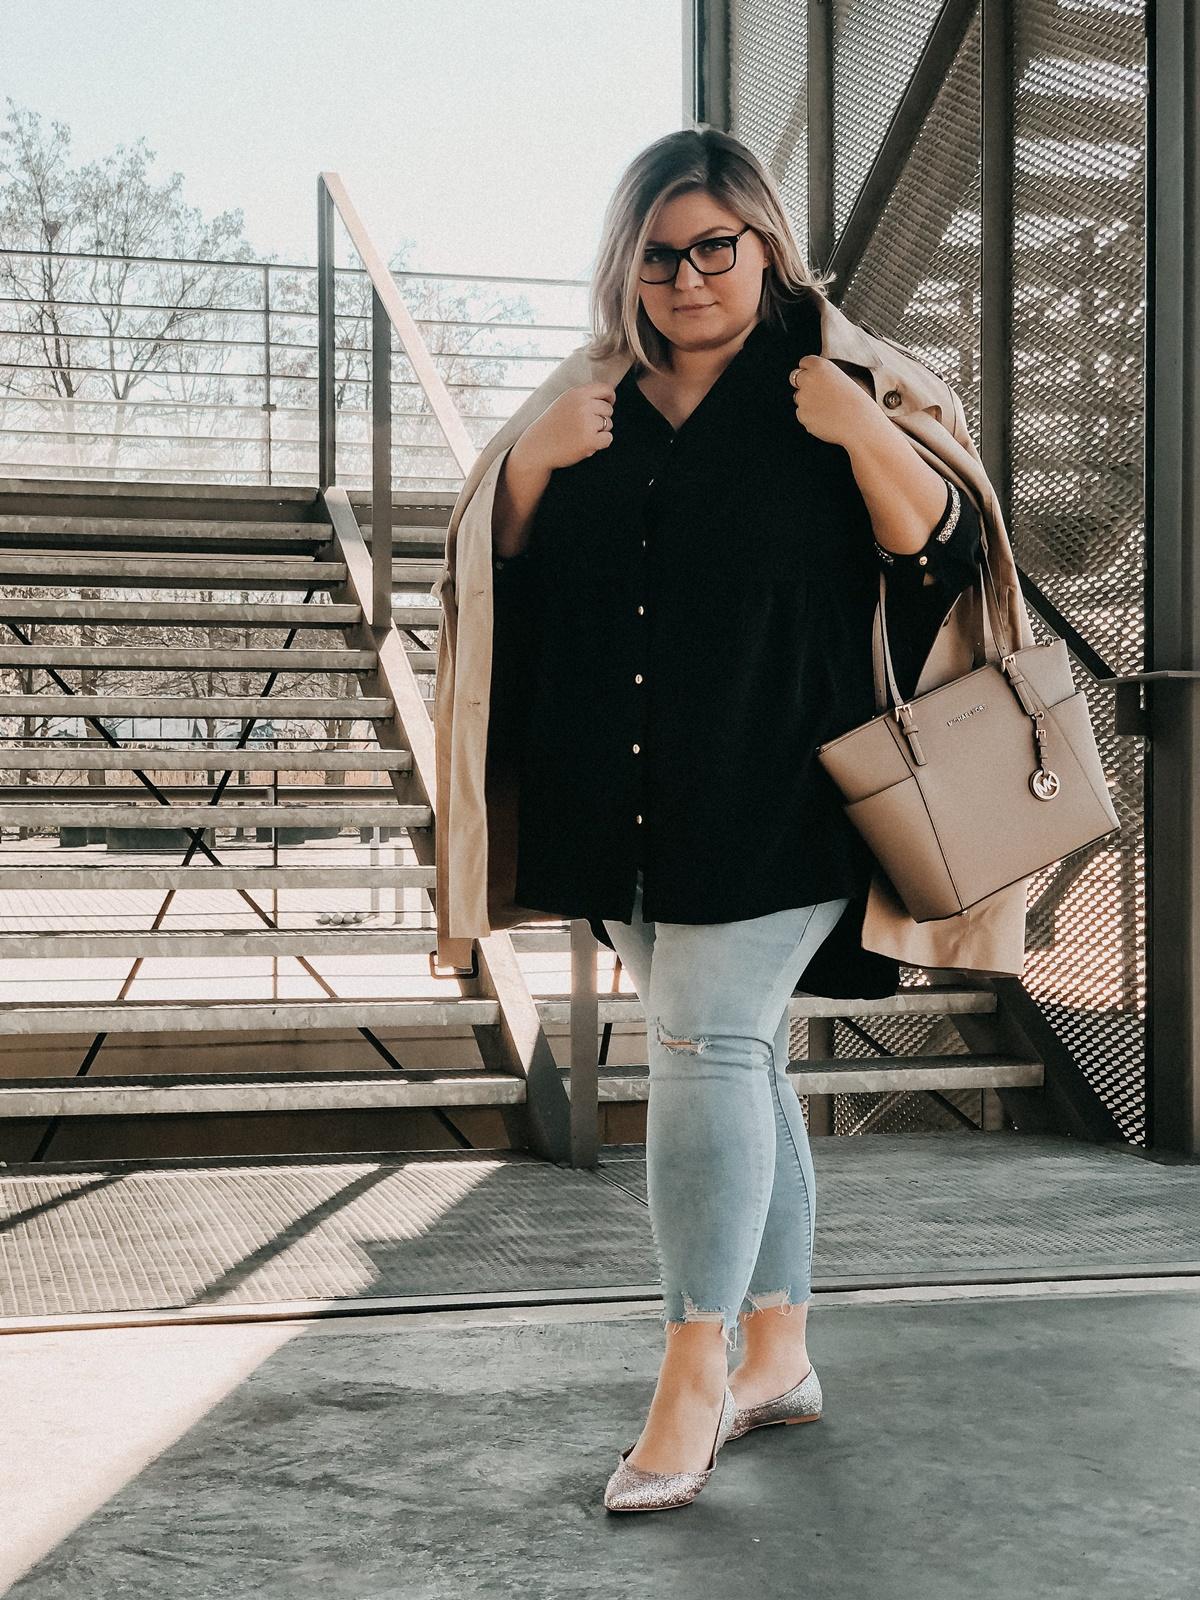 CITALEA Frühjahres Mode 2019 elabonbonella plus size fashion blog14